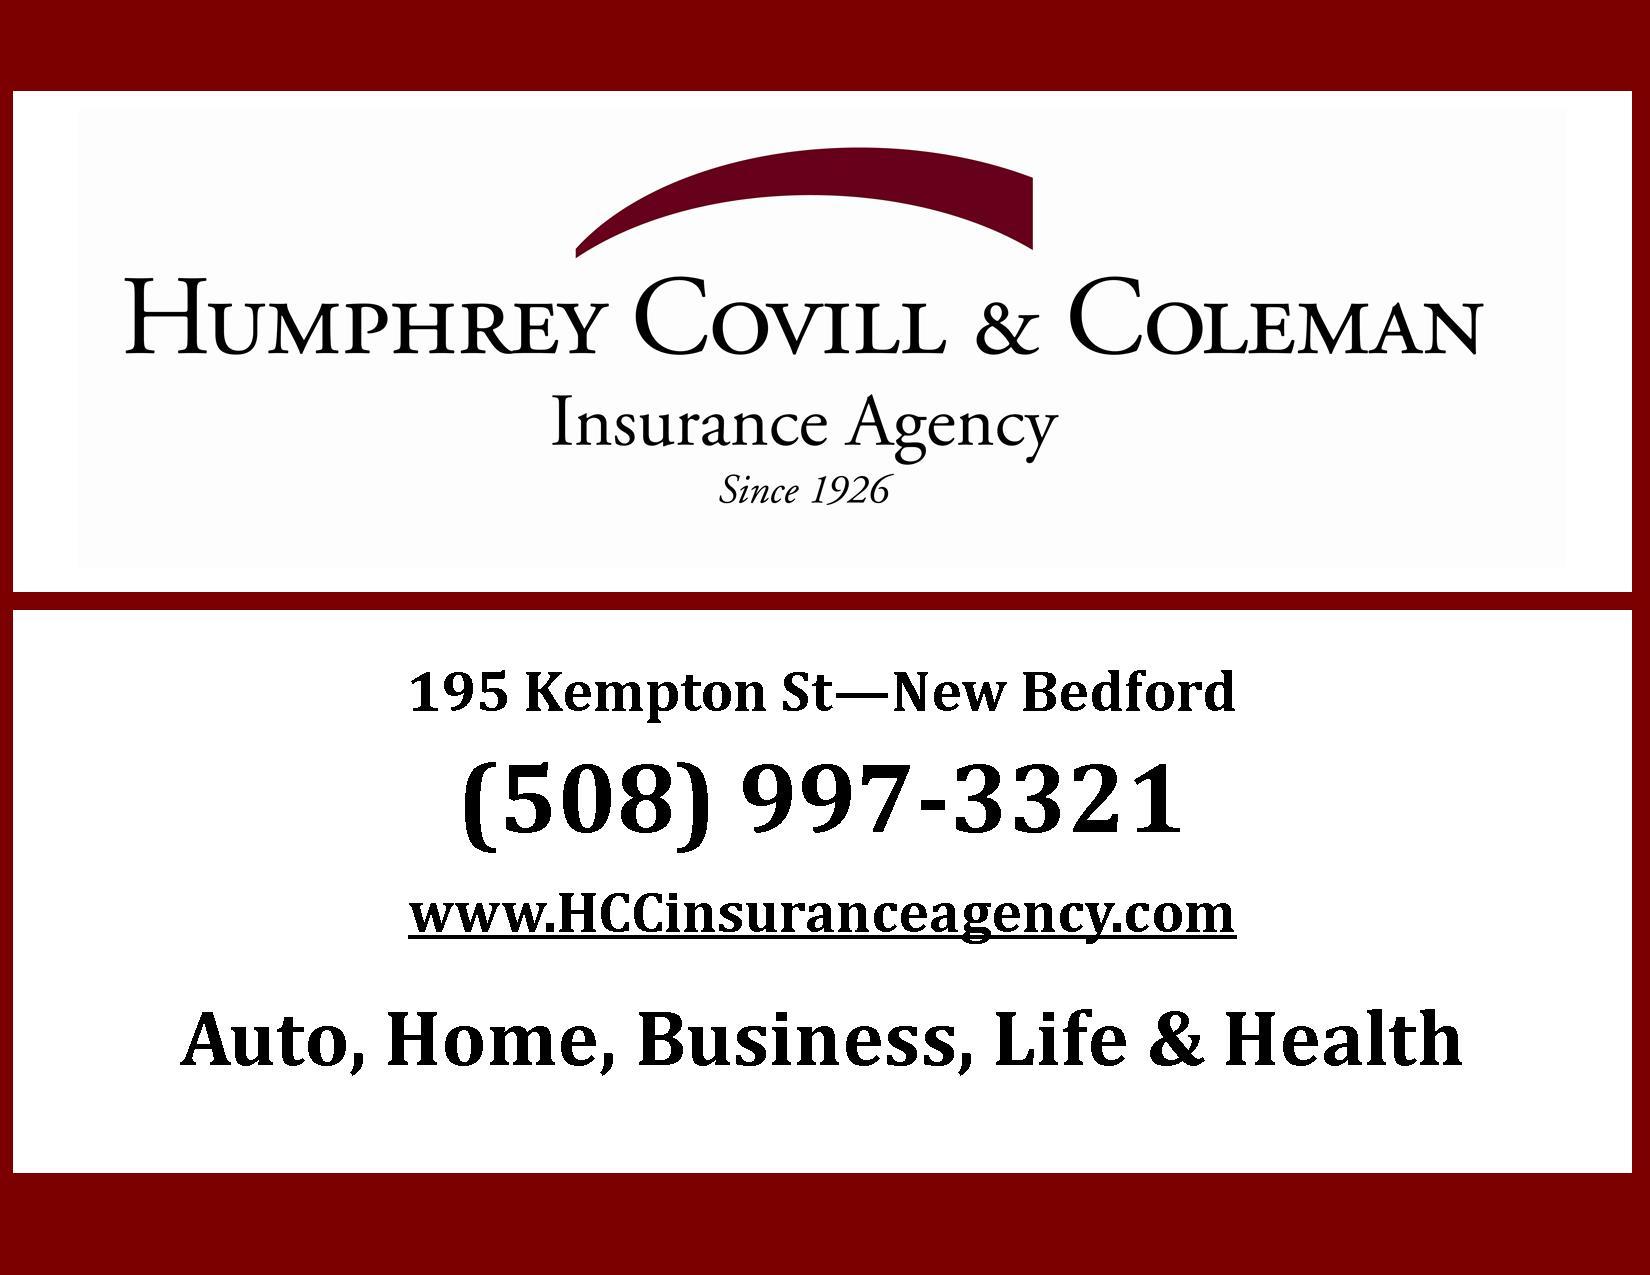 Humphrey, Covill & Coleman Insurance Agency Inc. image 1